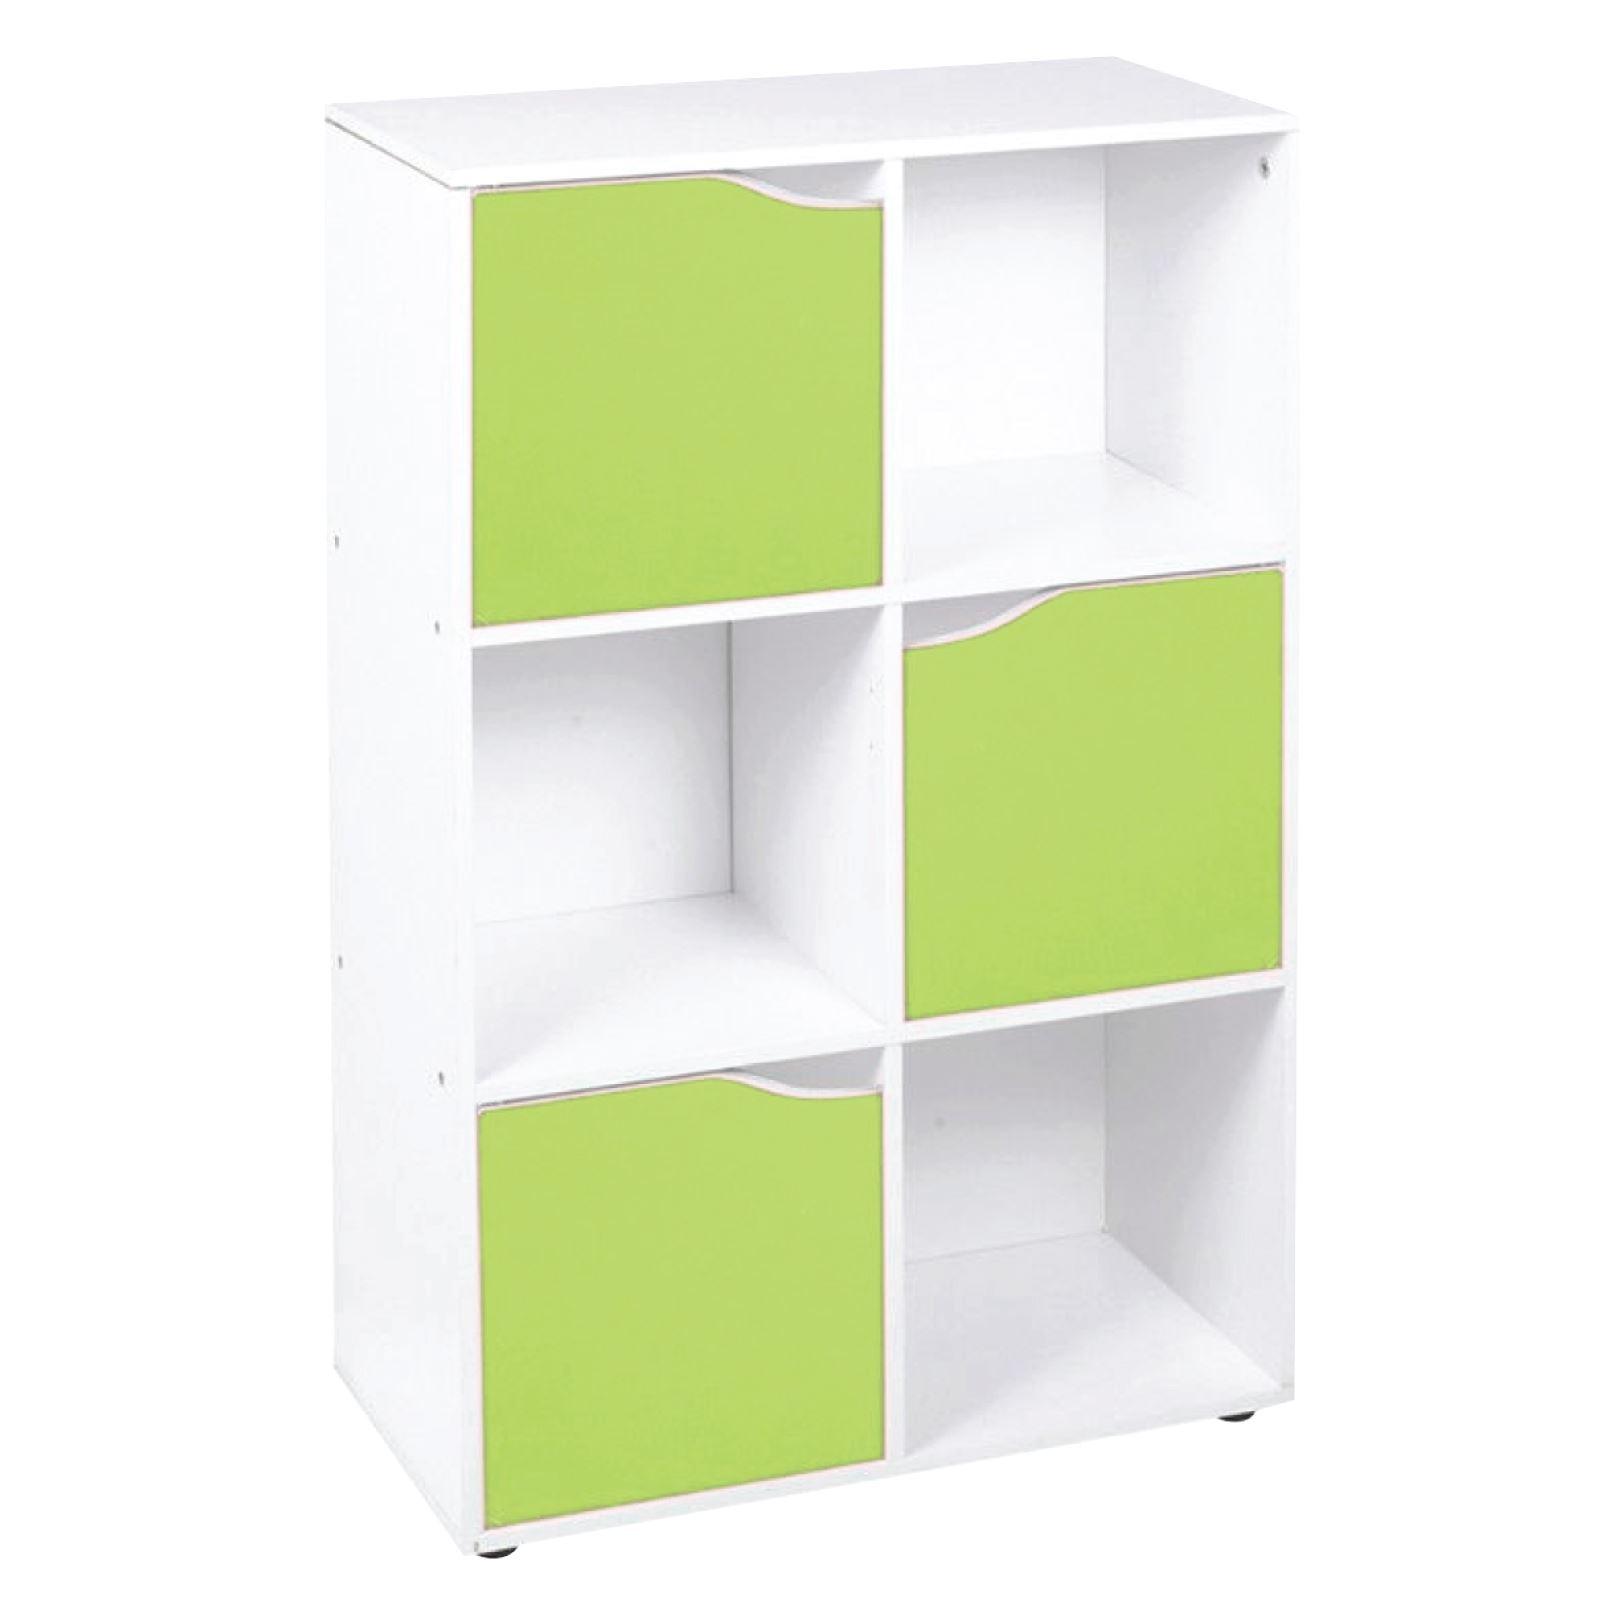 4 6 9 Cube Wooden Storage Unit Bookcase